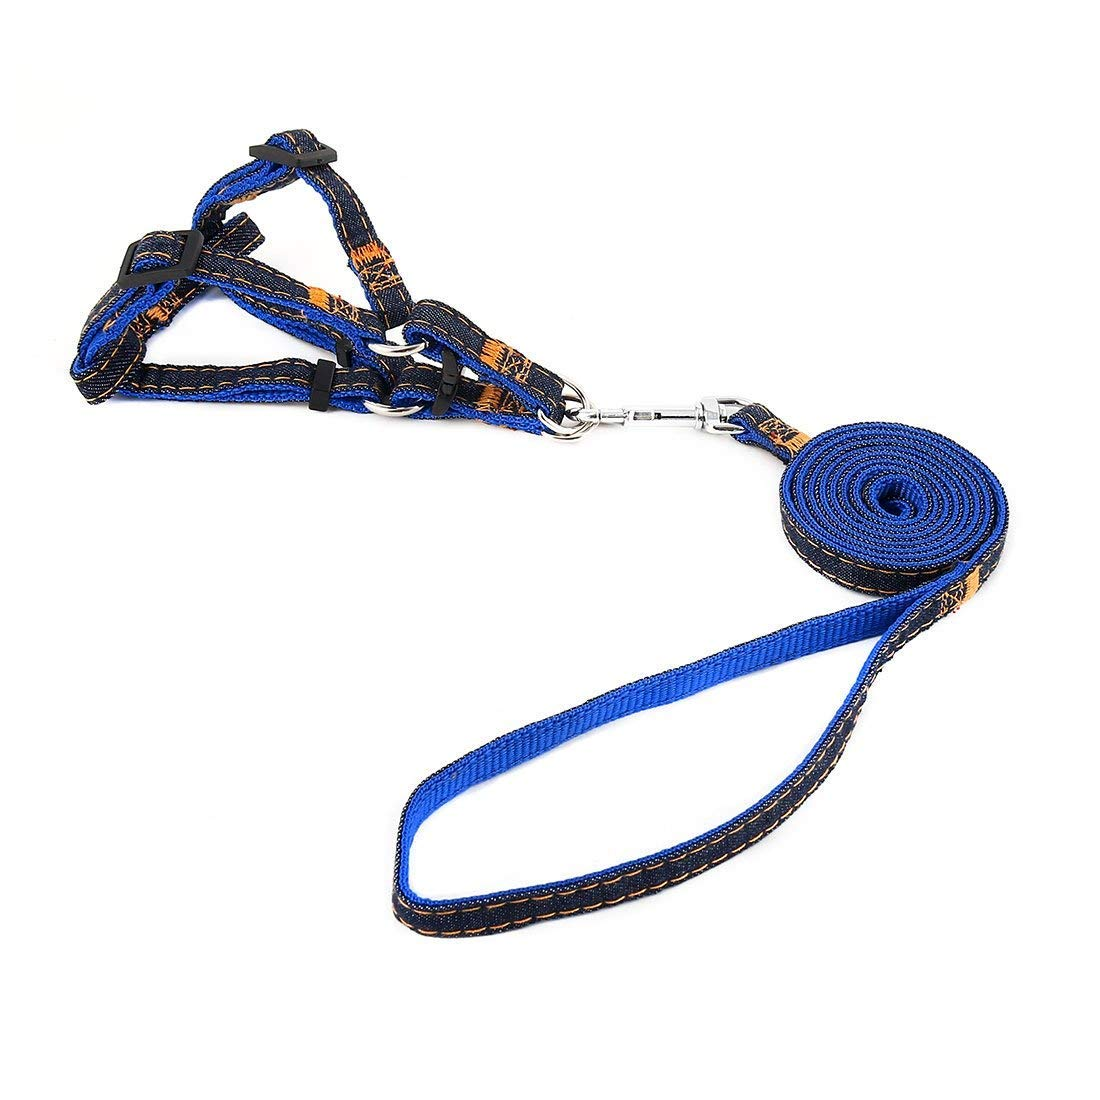 1Pc S, bluee   Denim Pet Dog Picnic Running Adjustable Handle Leash Rope Chest Harness